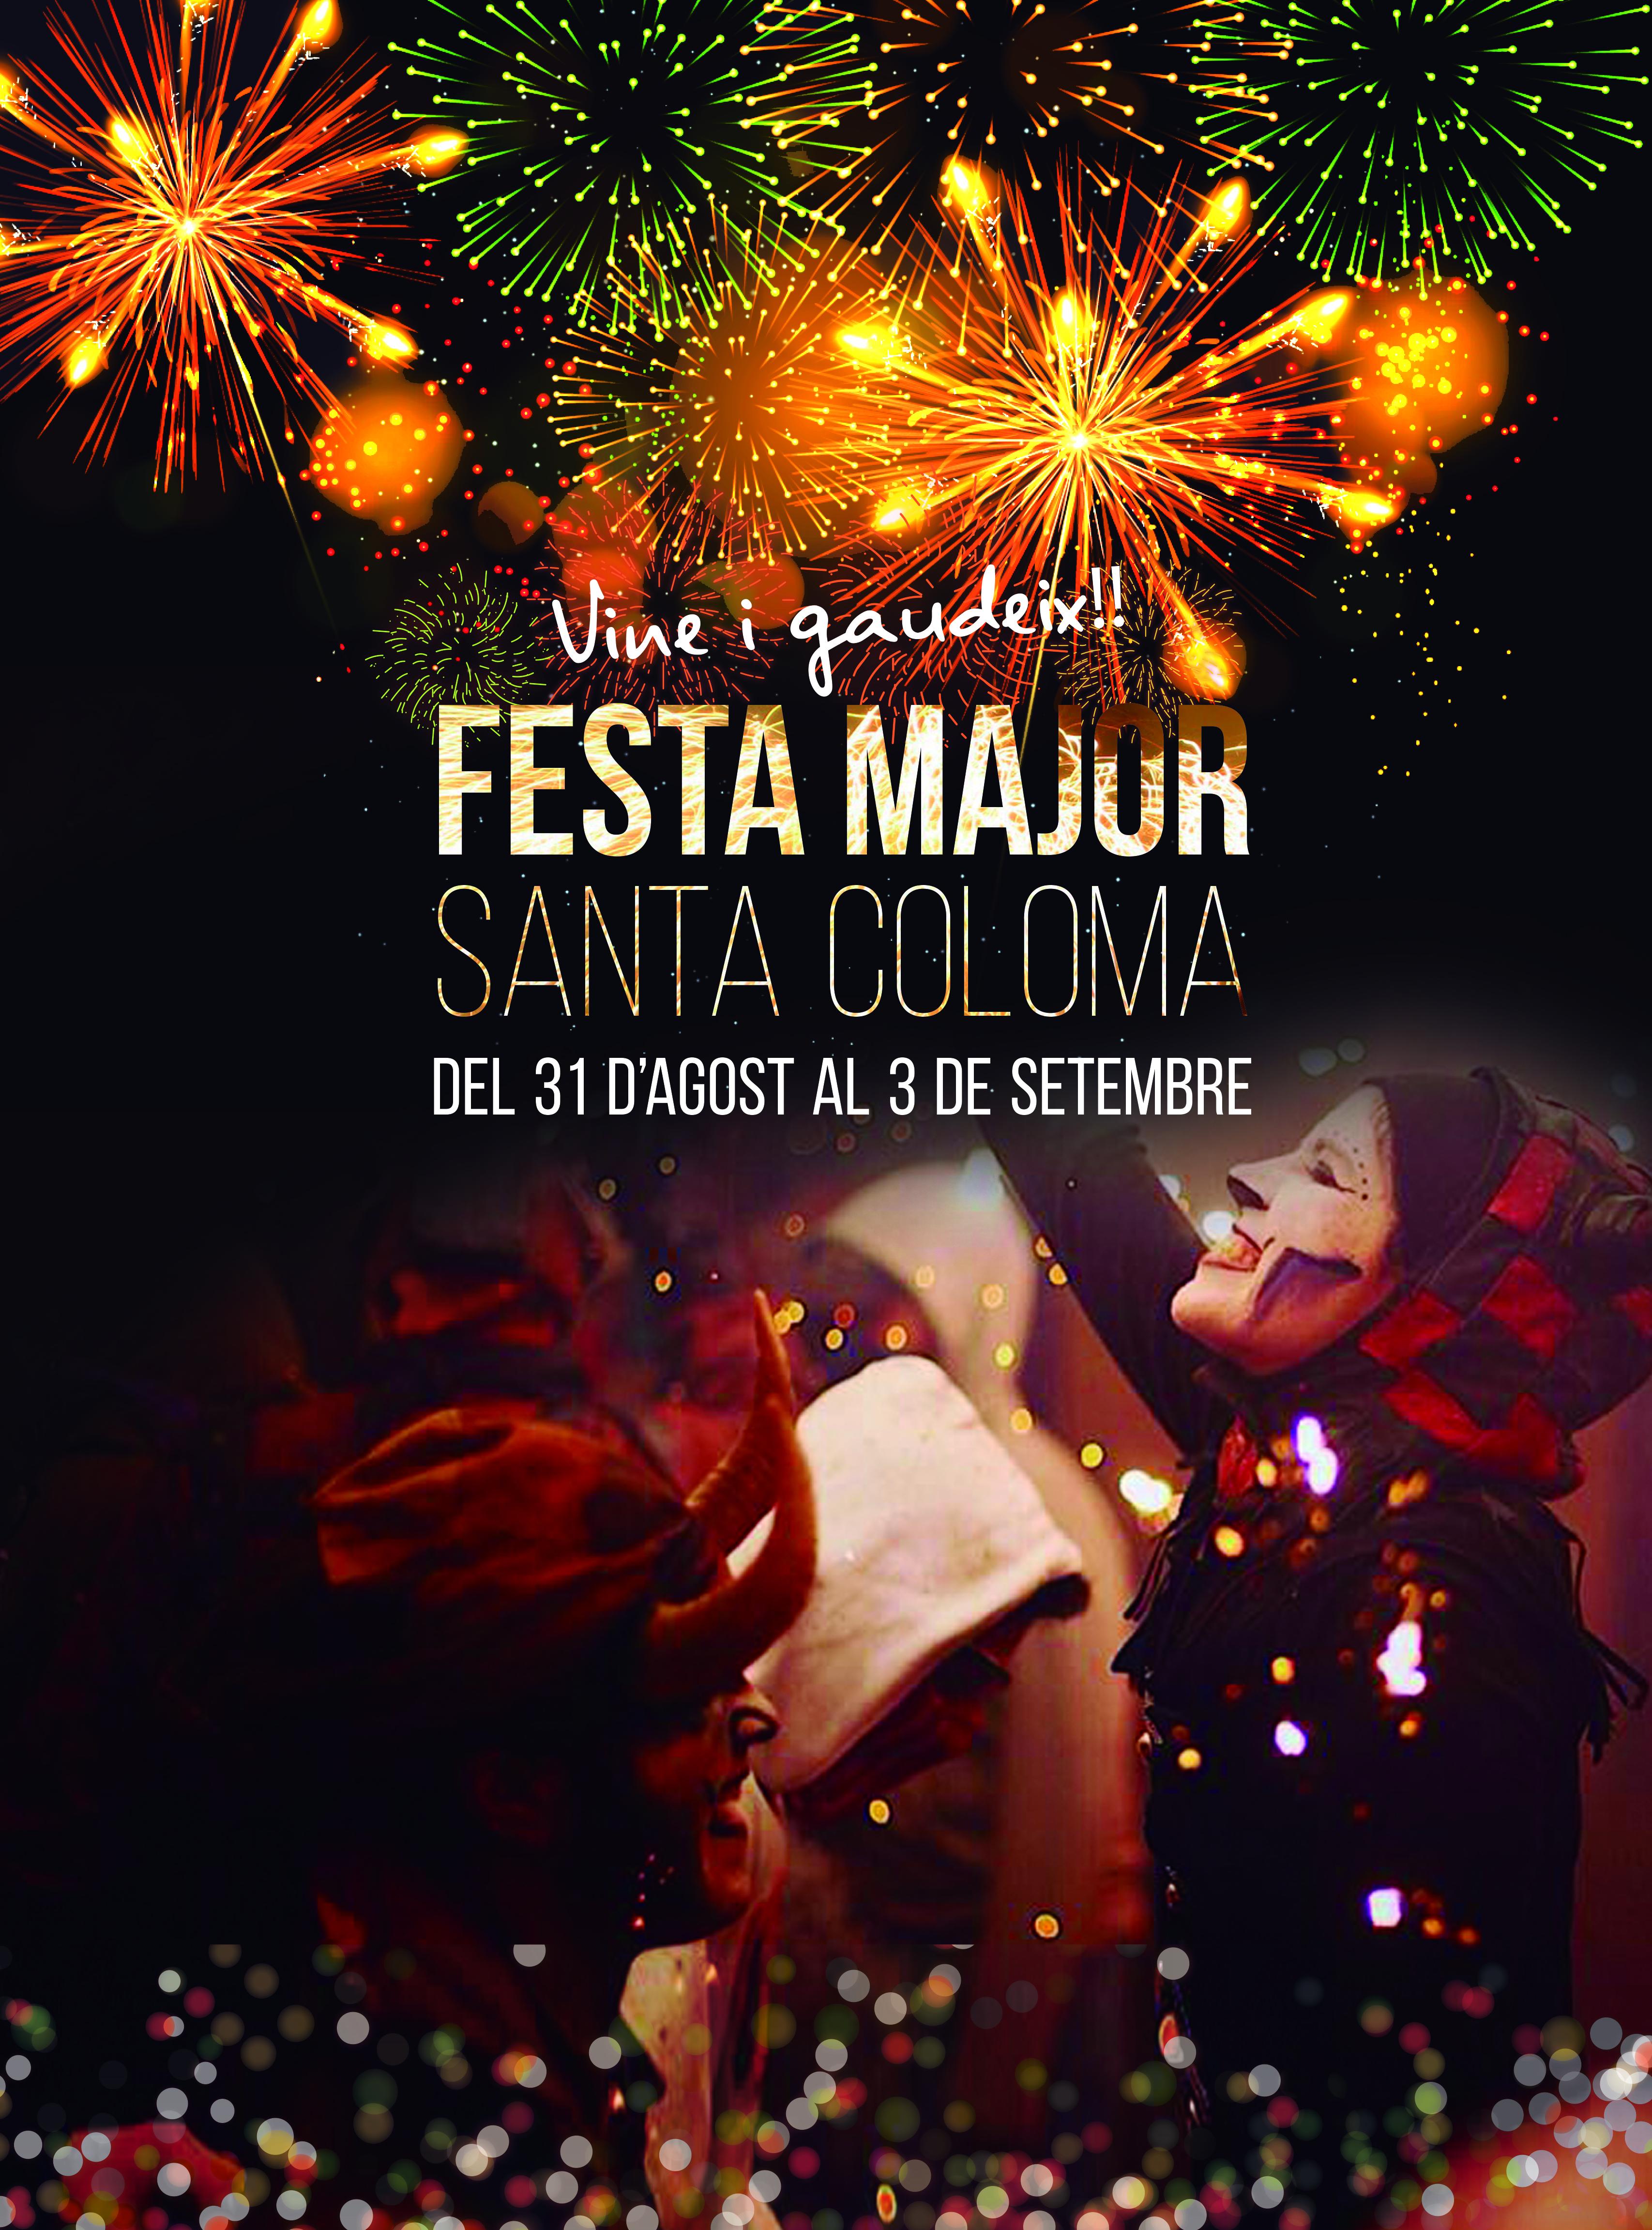 Festamajor Santa Coloma